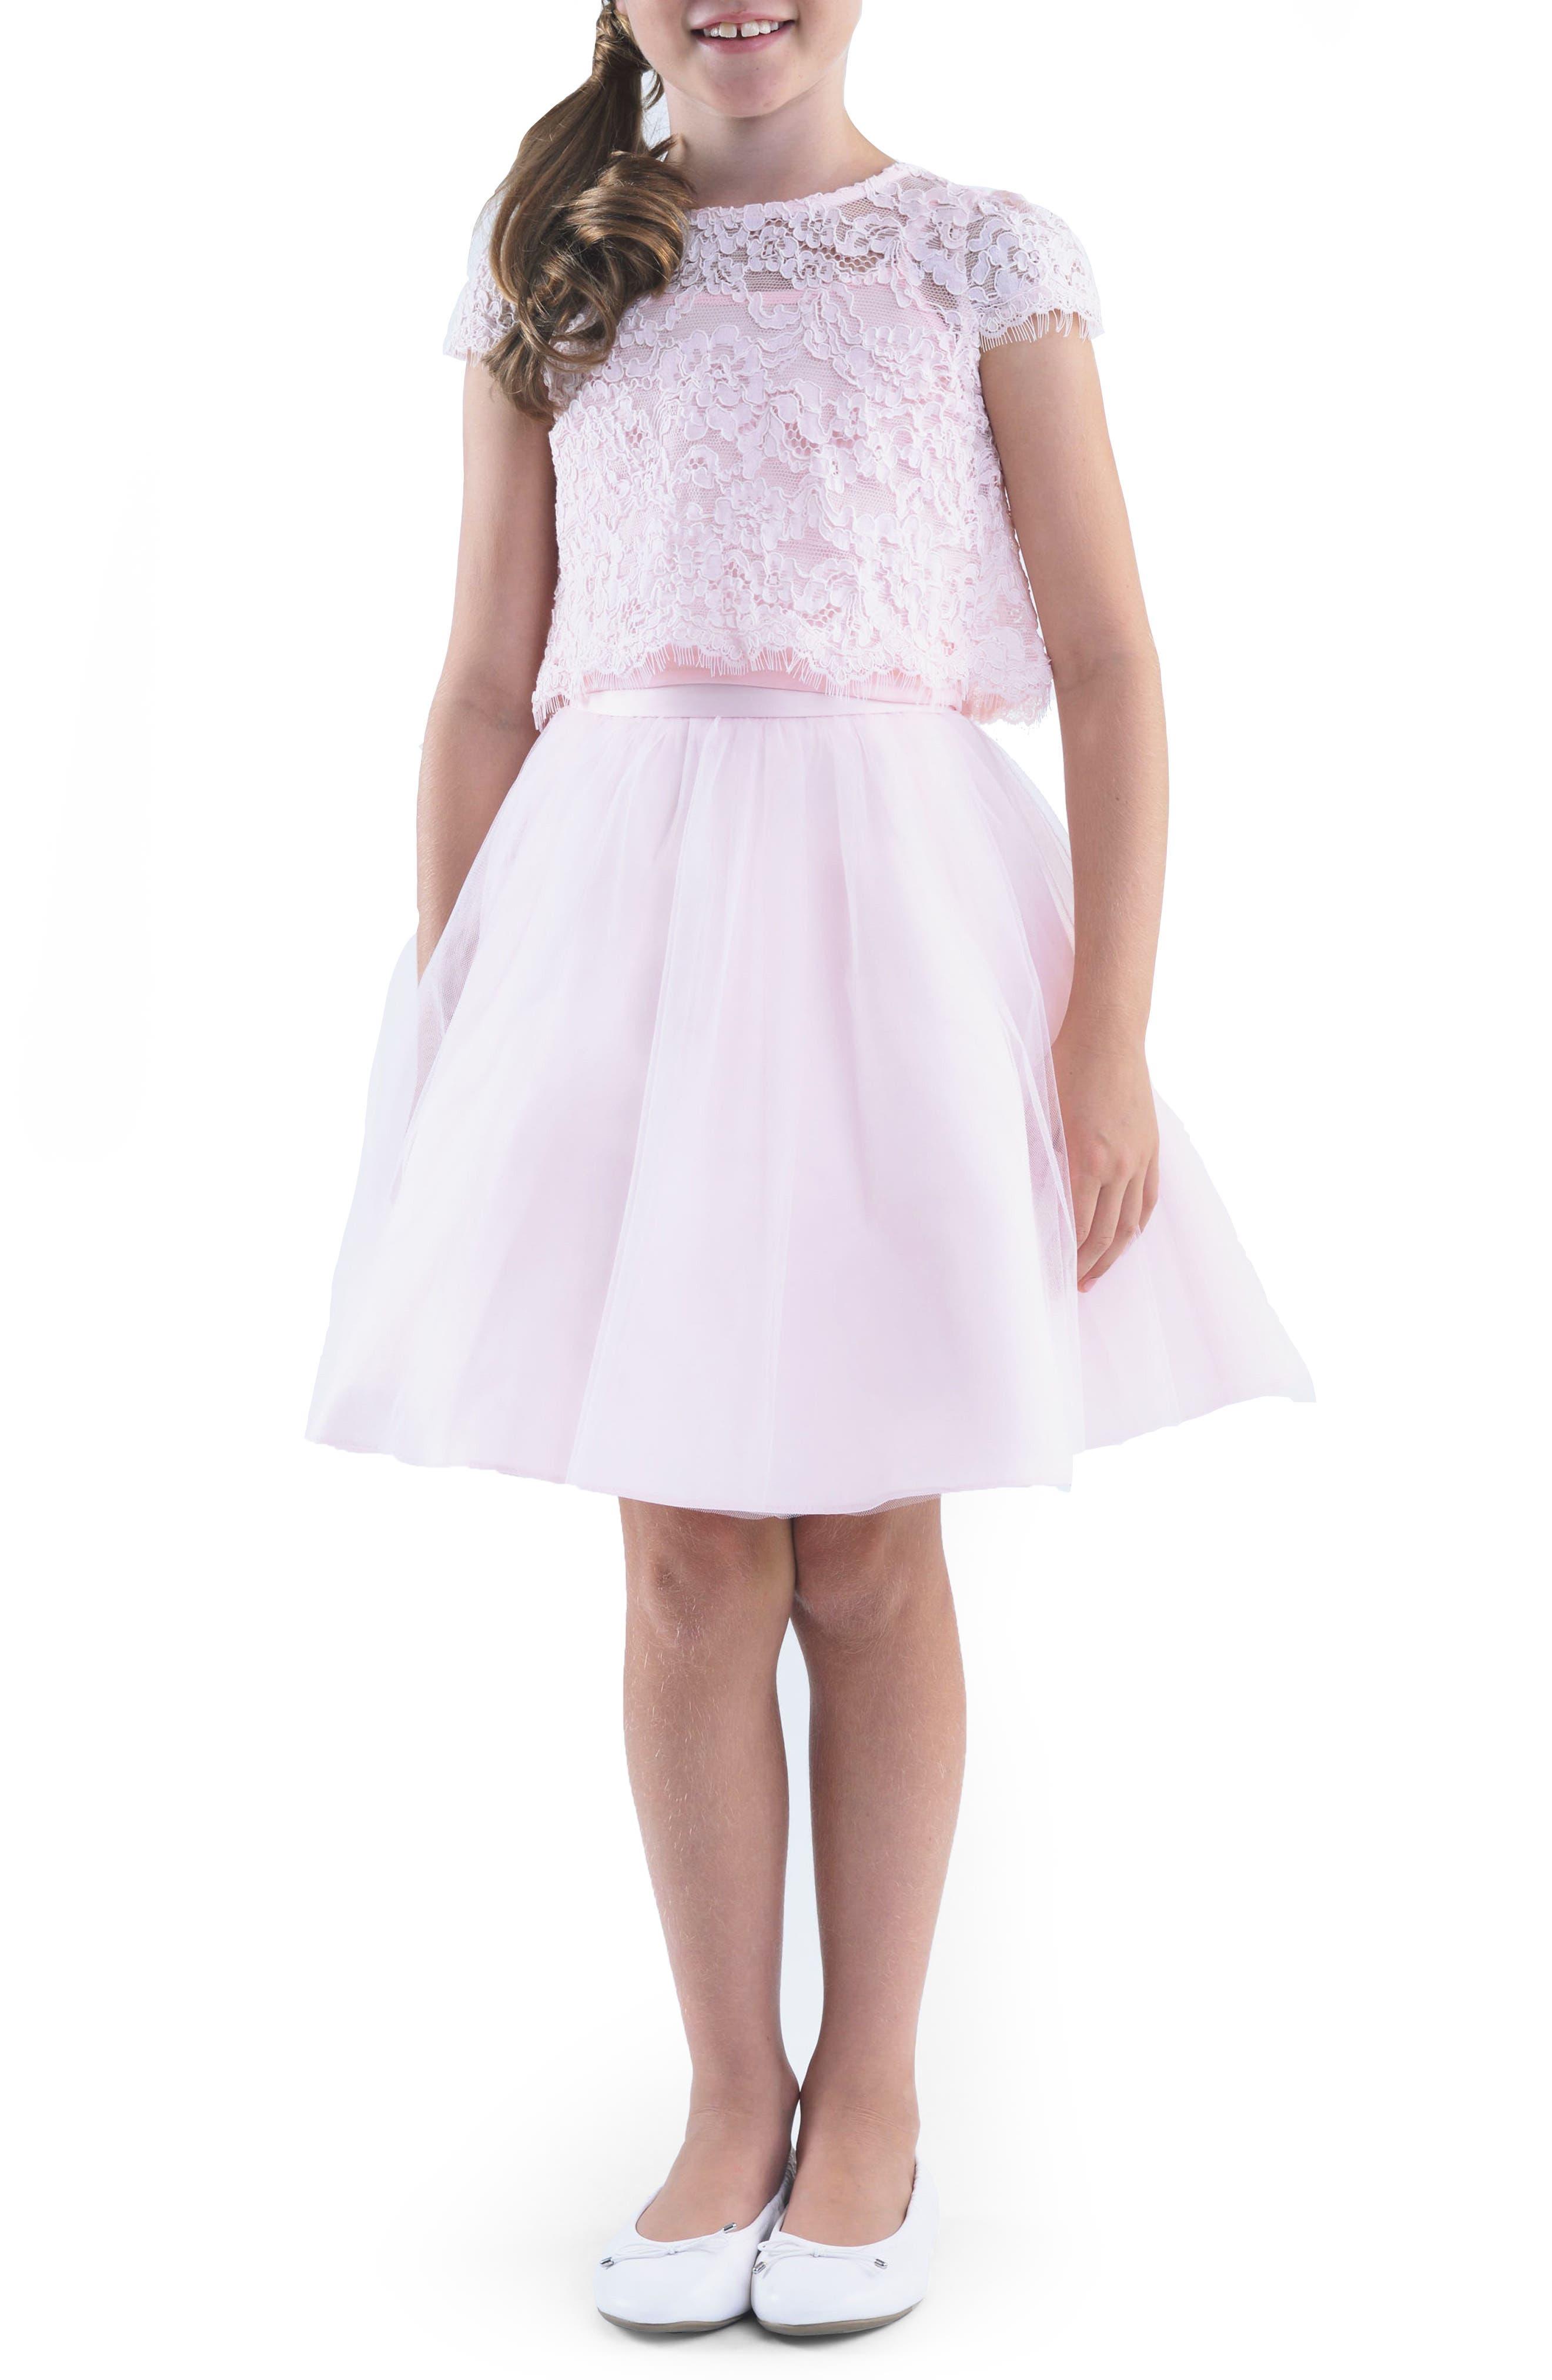 Alternate Image 1 Selected - Us Angels Lace Top & Mesh Skirt Set (Toddler Girls, Little Girls & Big Girls)